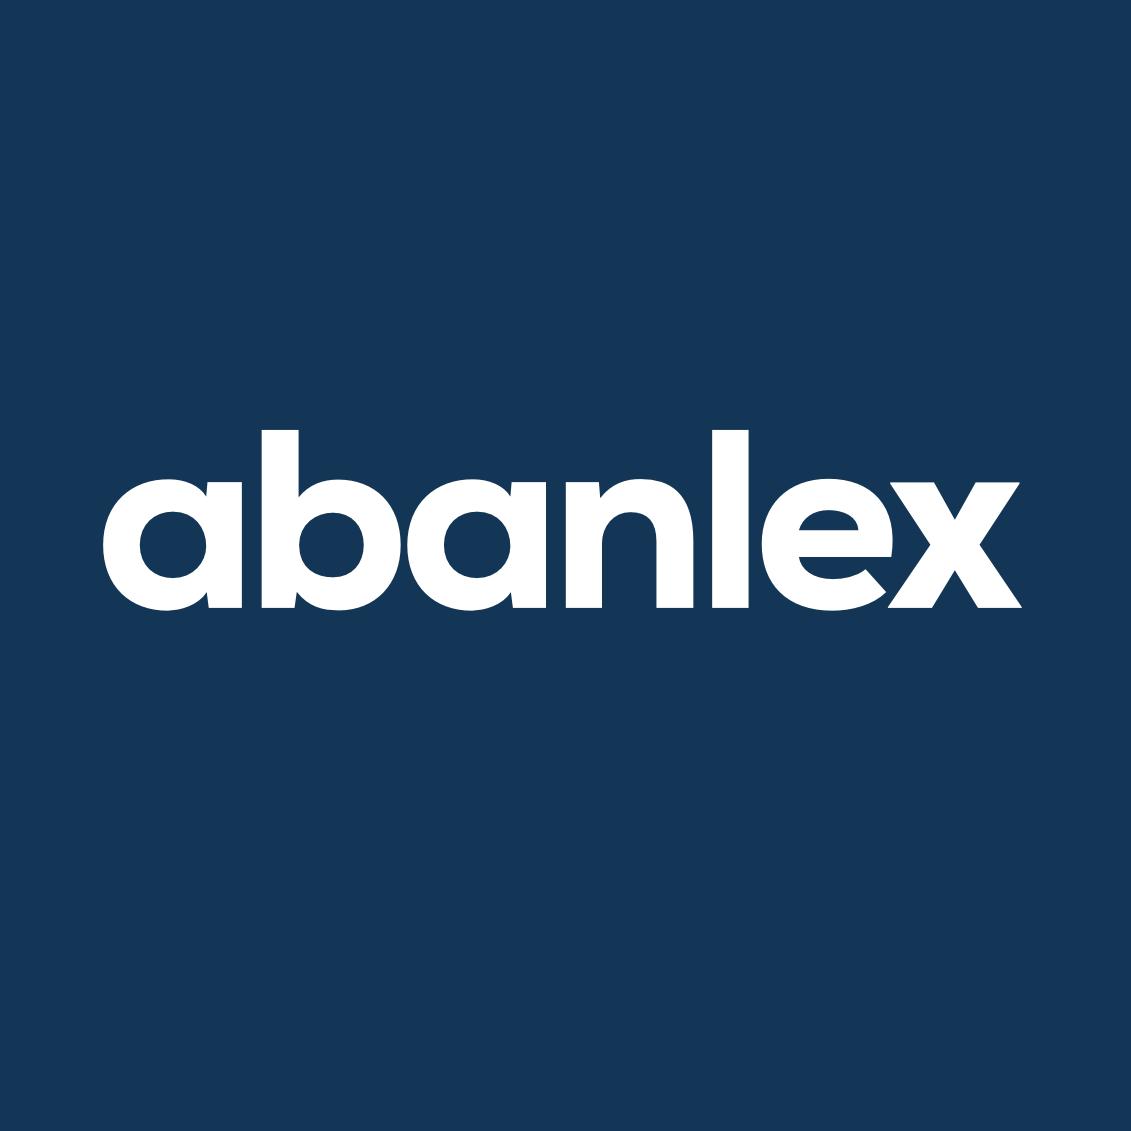 3.- Abanlex blanco – fondo azul